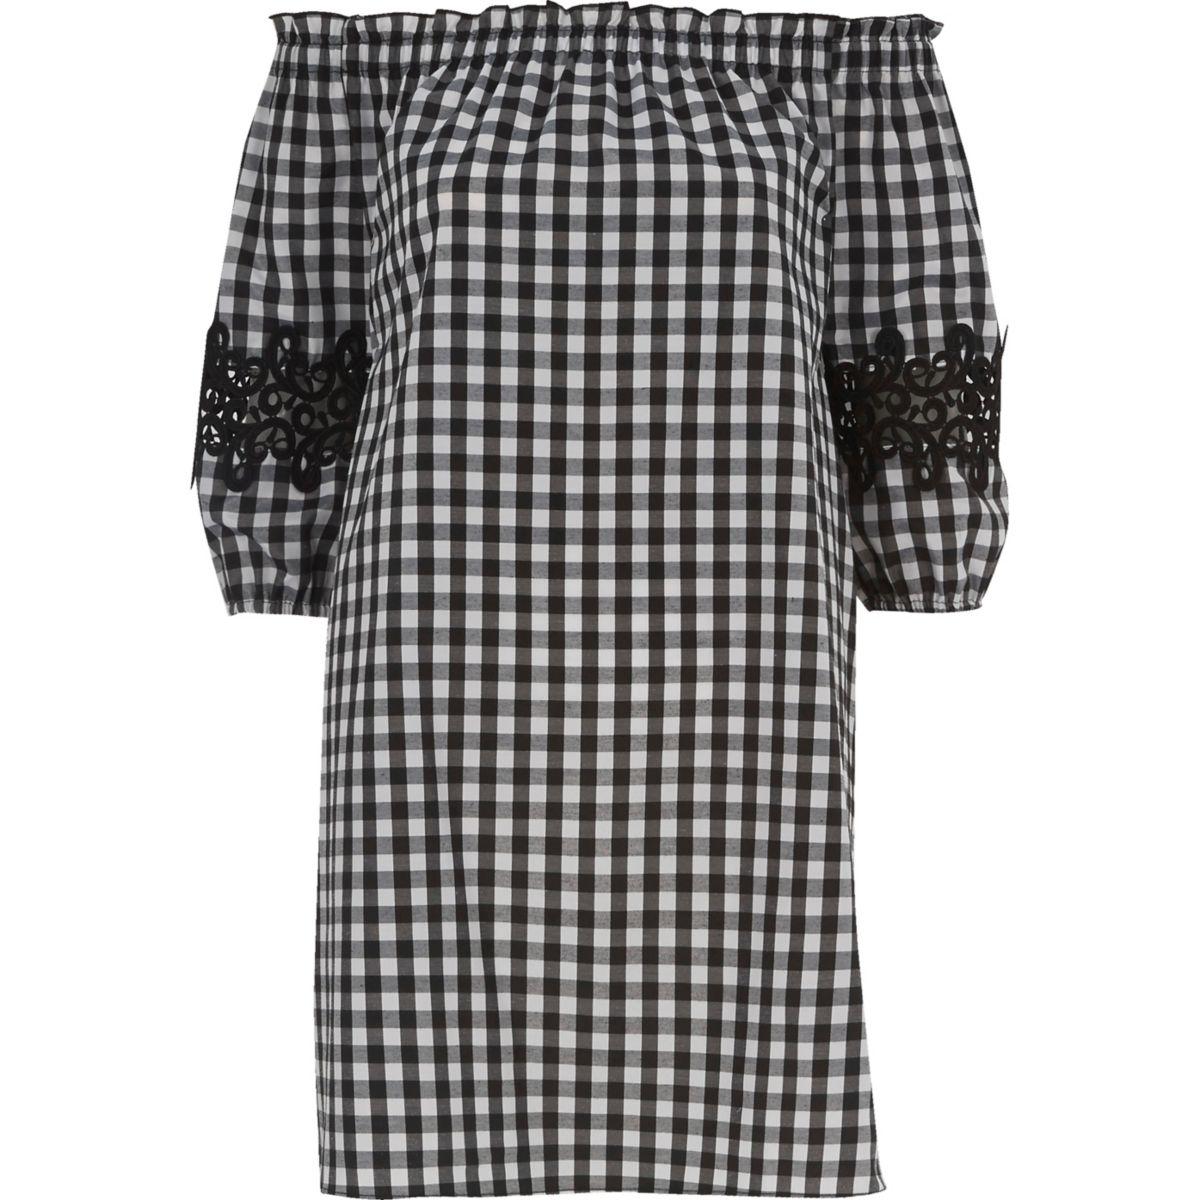 Black gingham check bardot swing dress